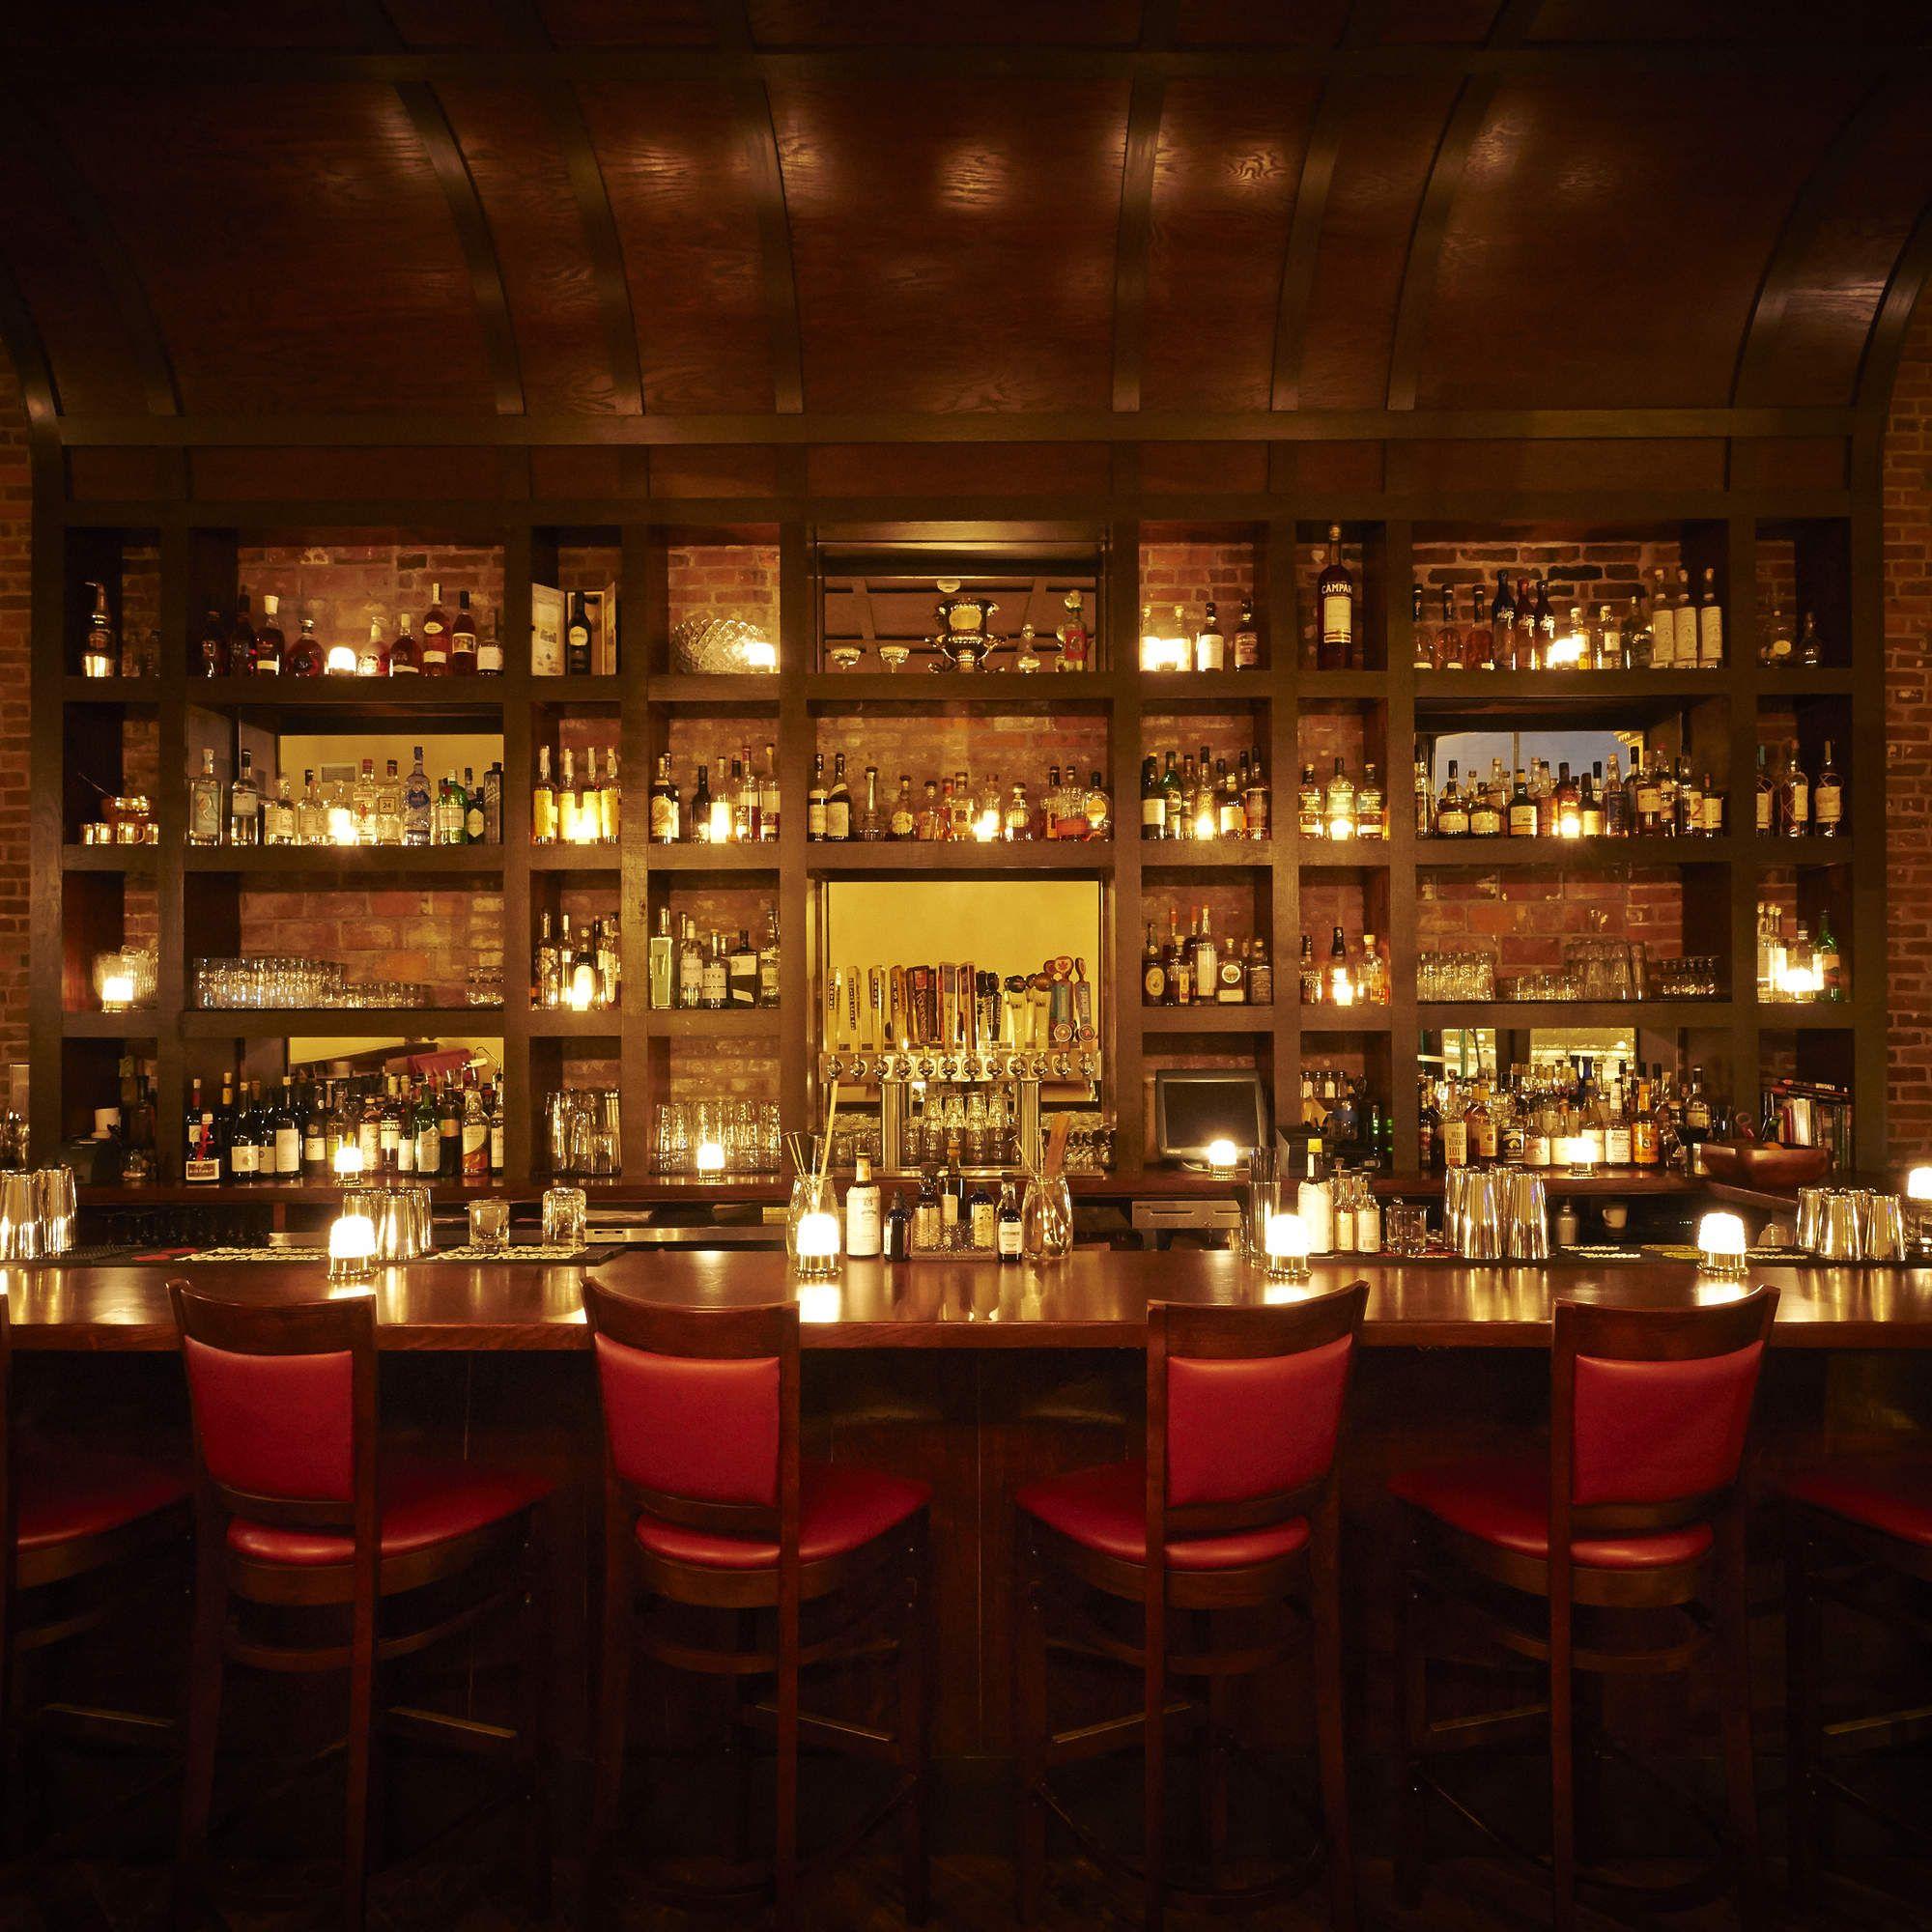 The 21 best new bars in America   Tiki, Tiki bar, Bar